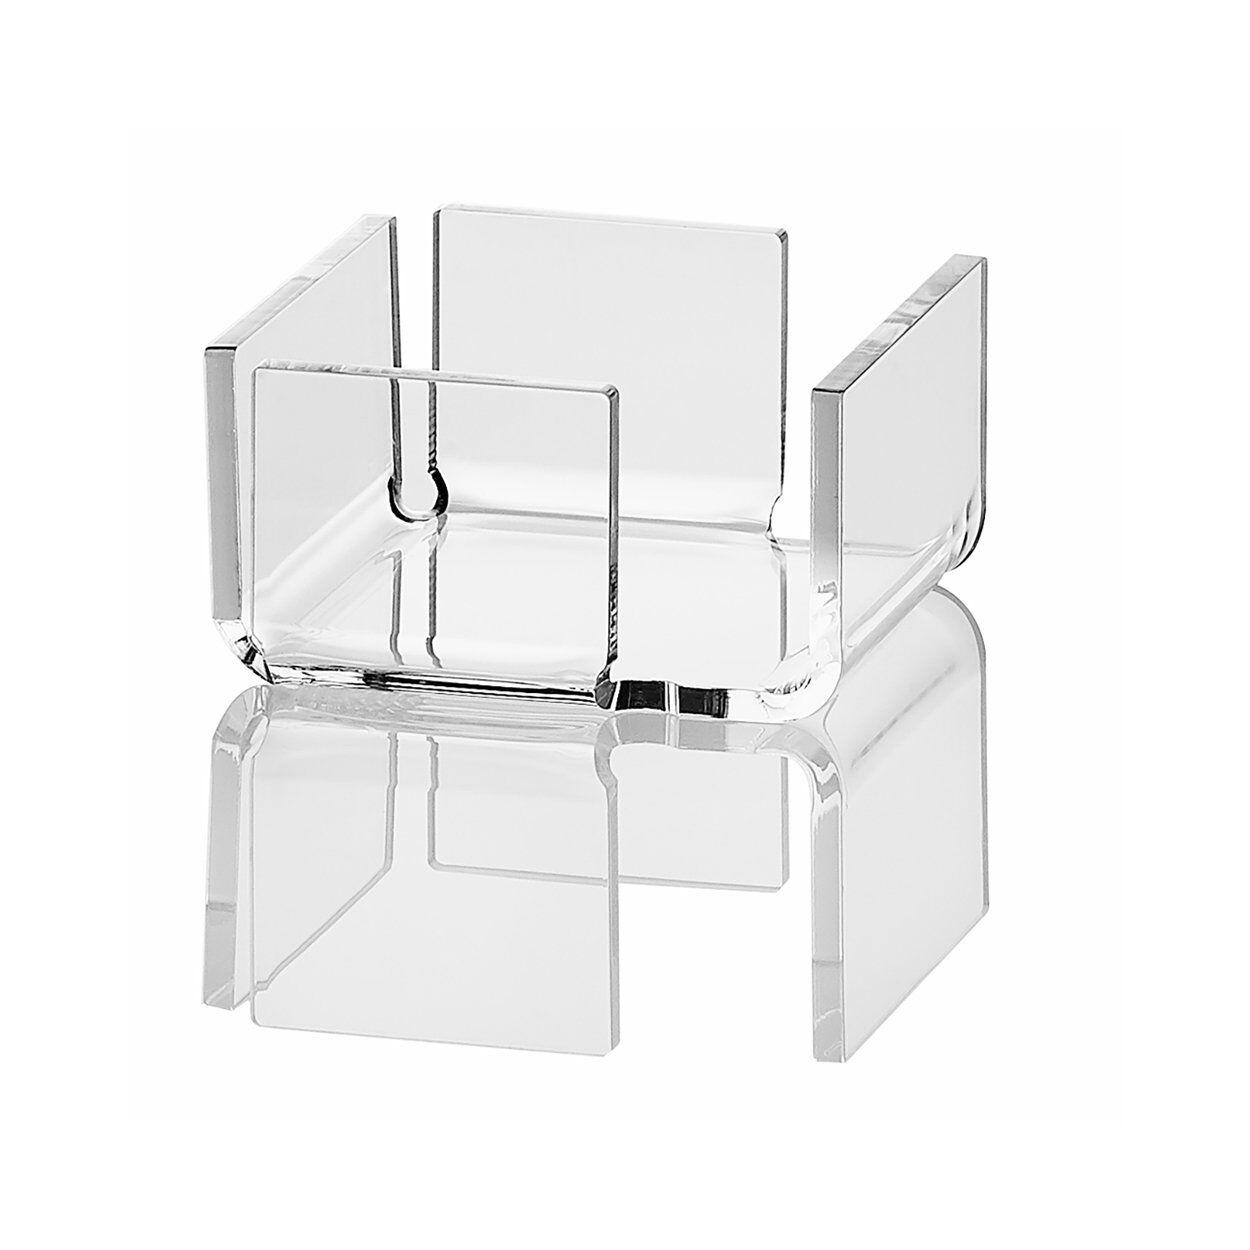 INOXRIV Flash crystal 8 porta bustine zucchero /tovaglioli 10,4x9,9